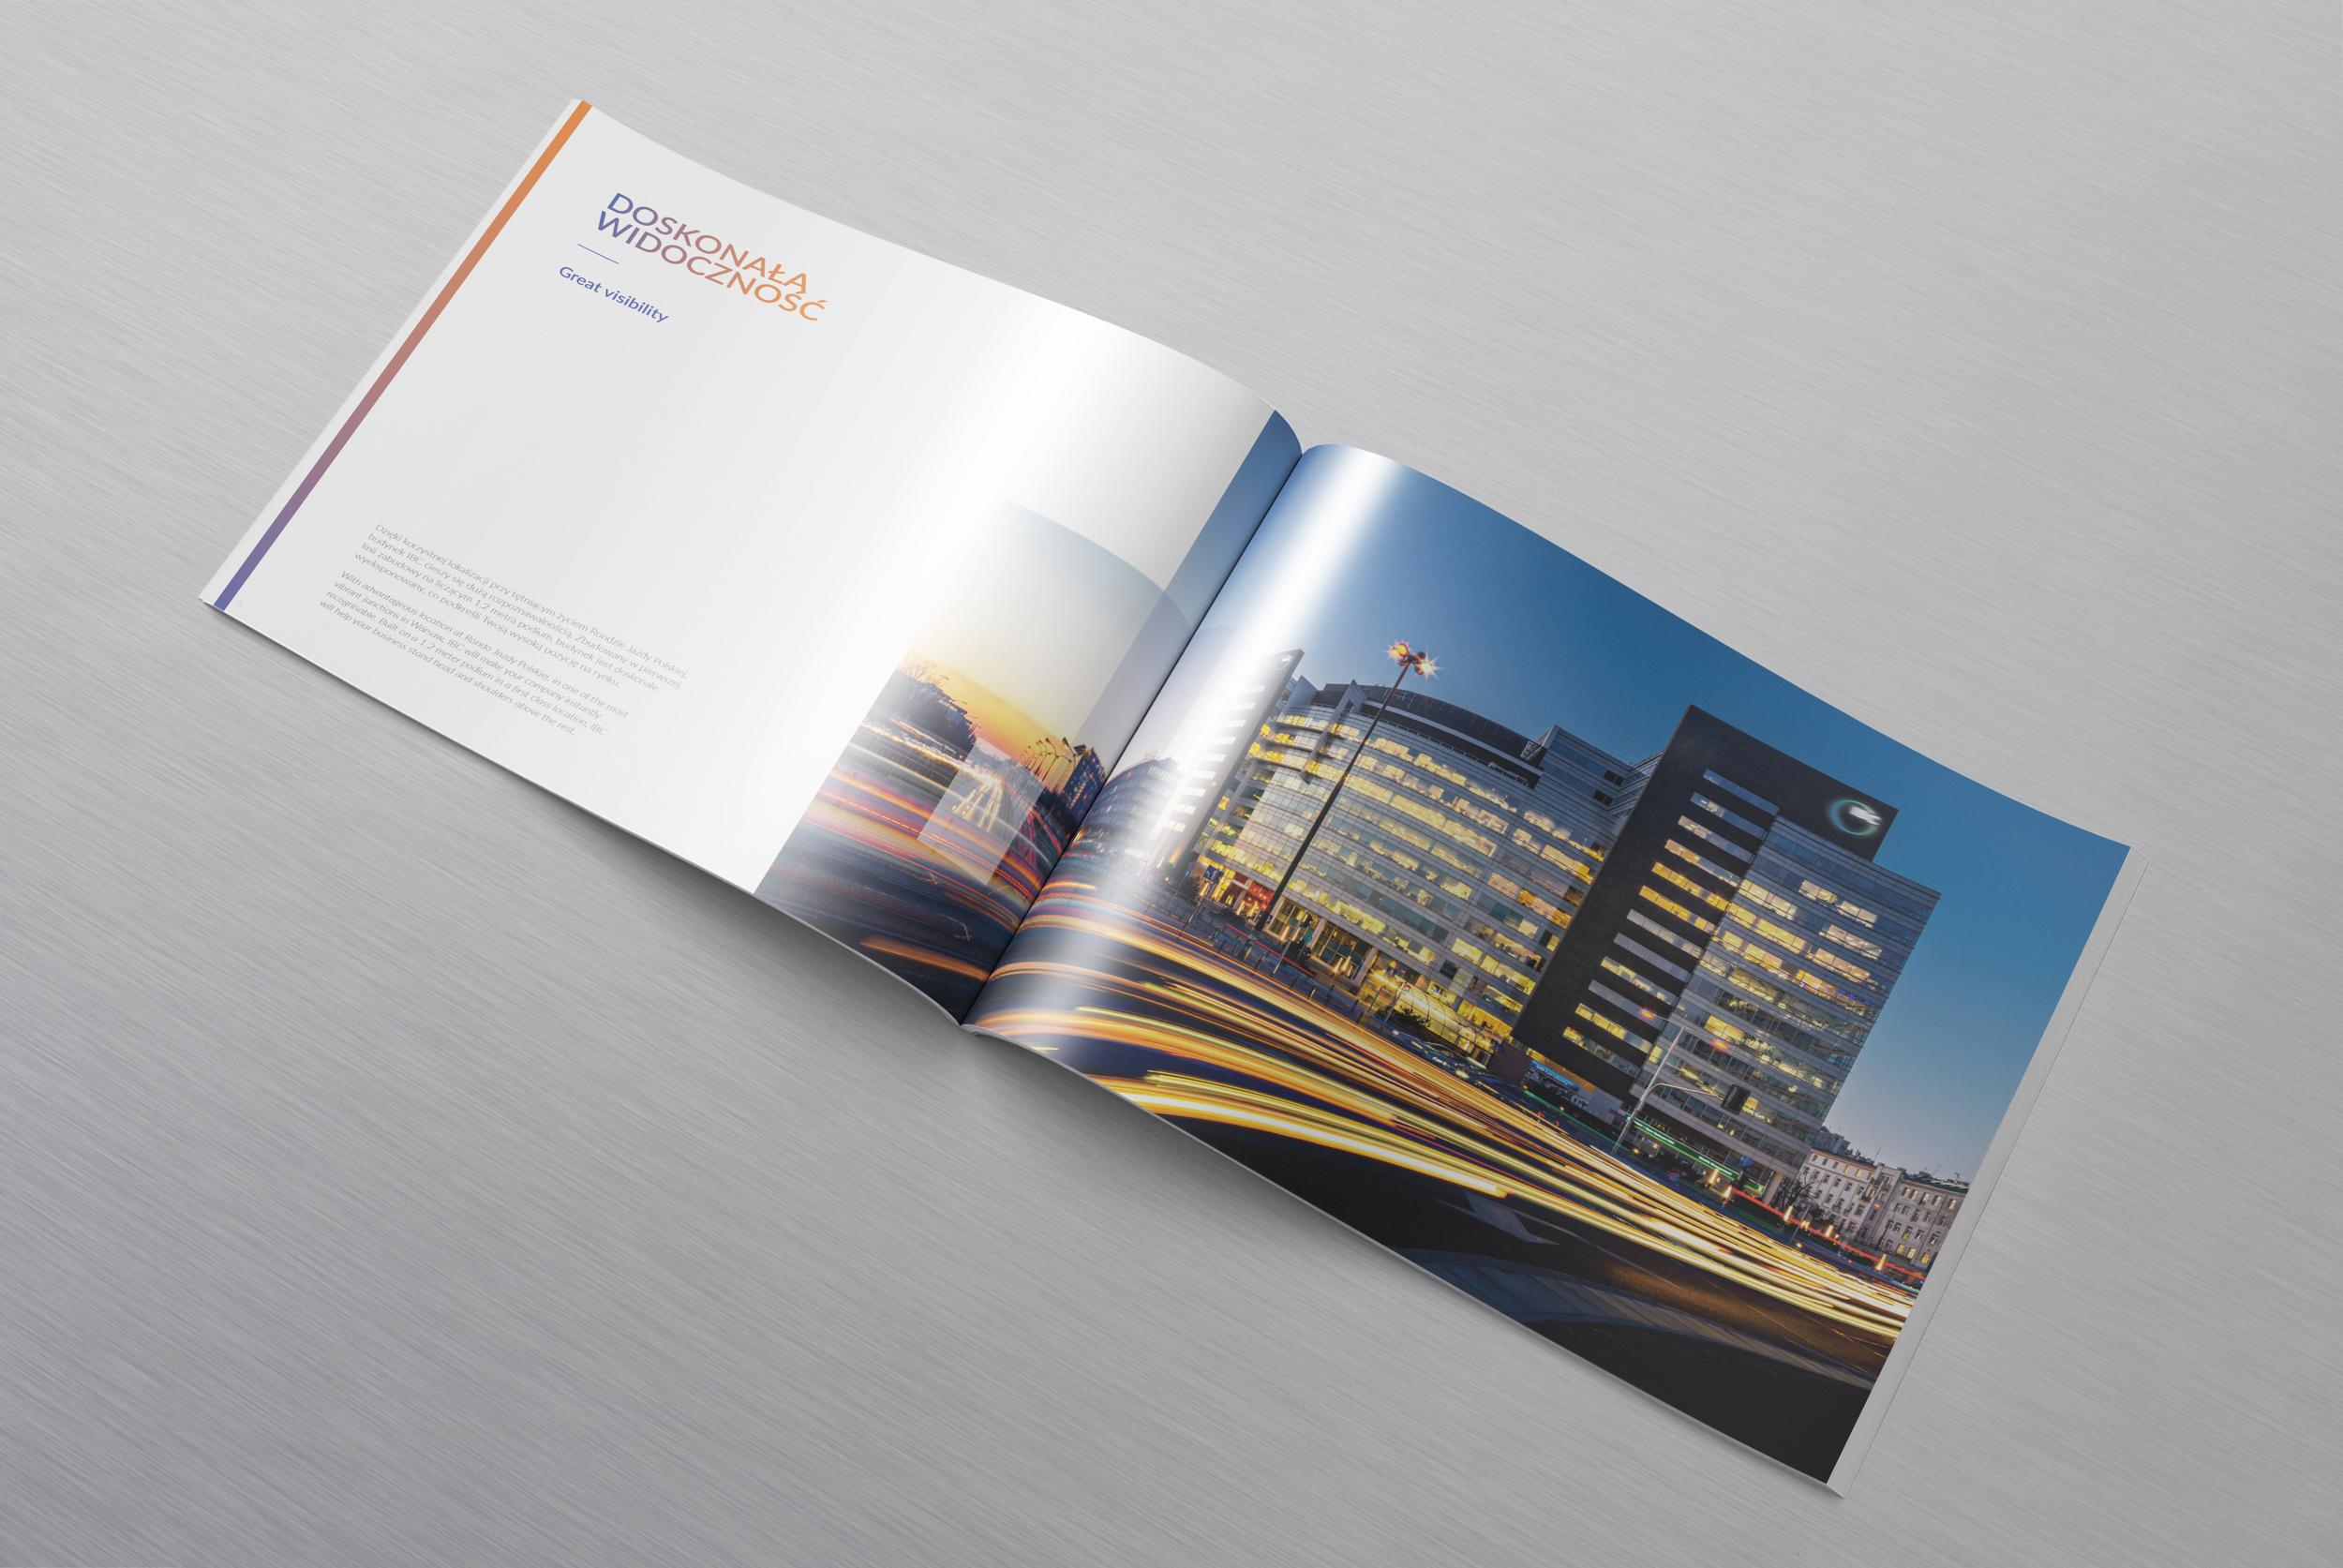 2015 Deka IBC brochure 3.jpg